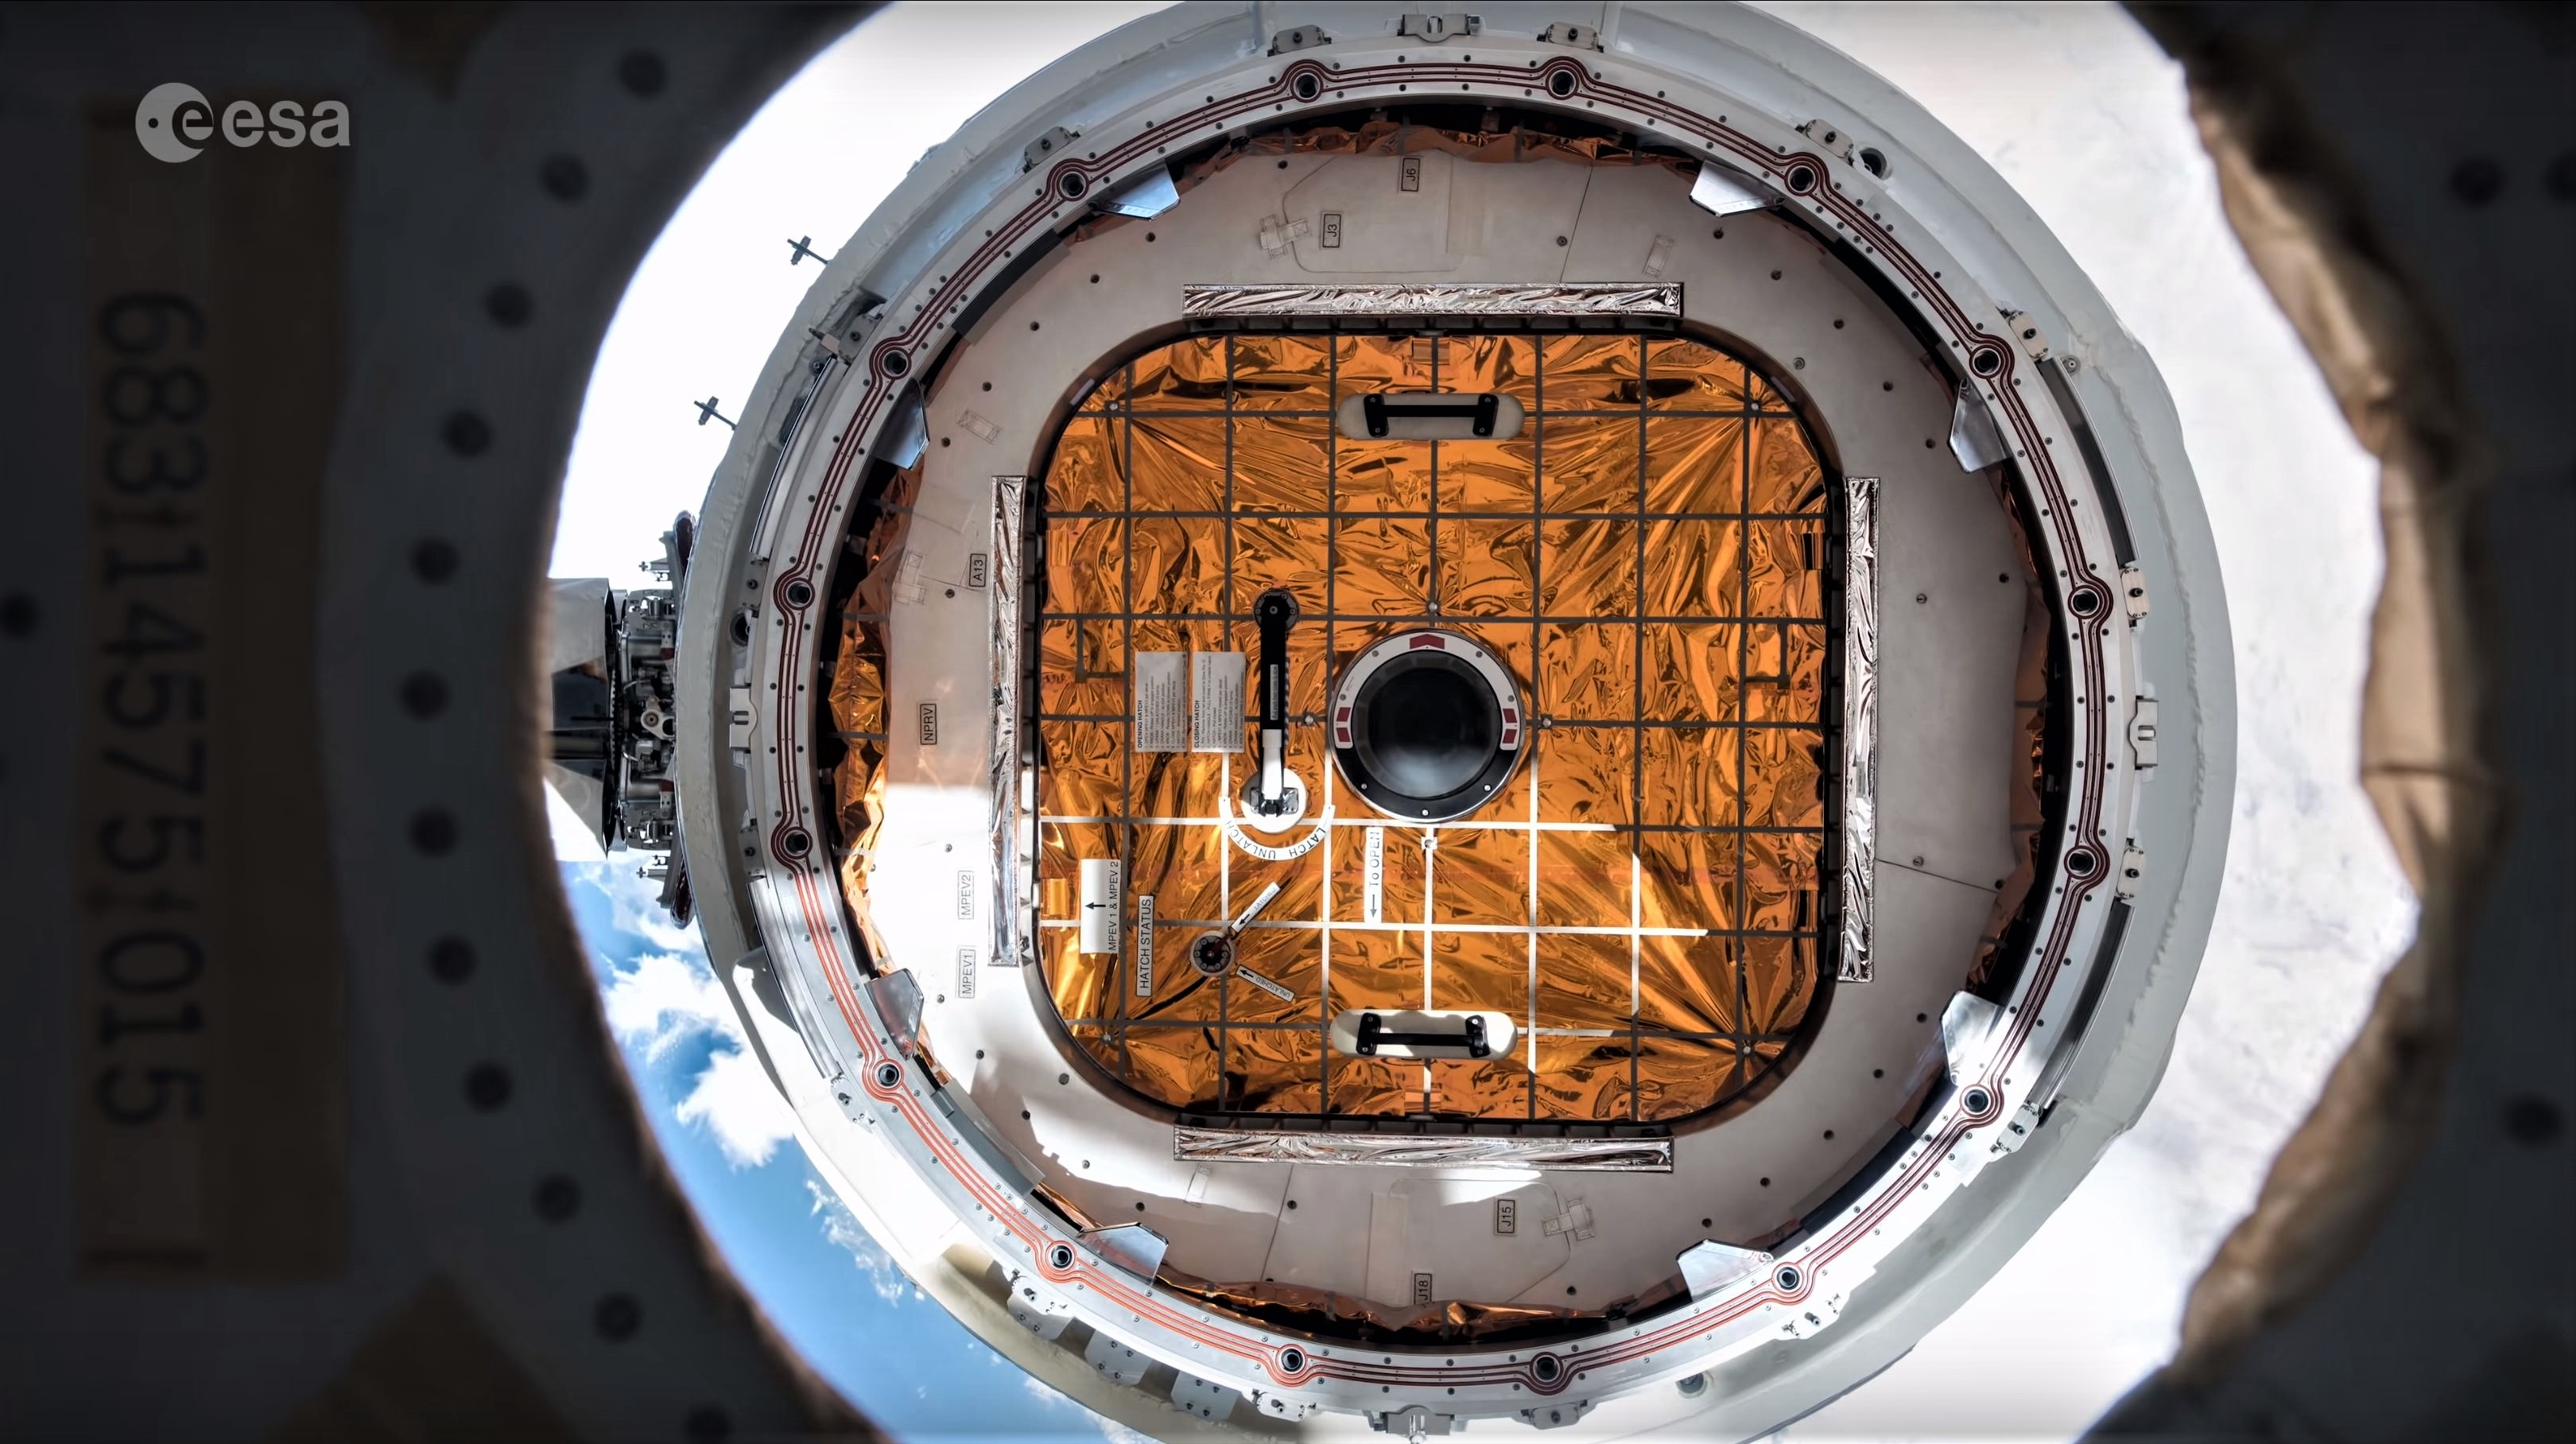 CRS-15 departure 4K (ESA) 1